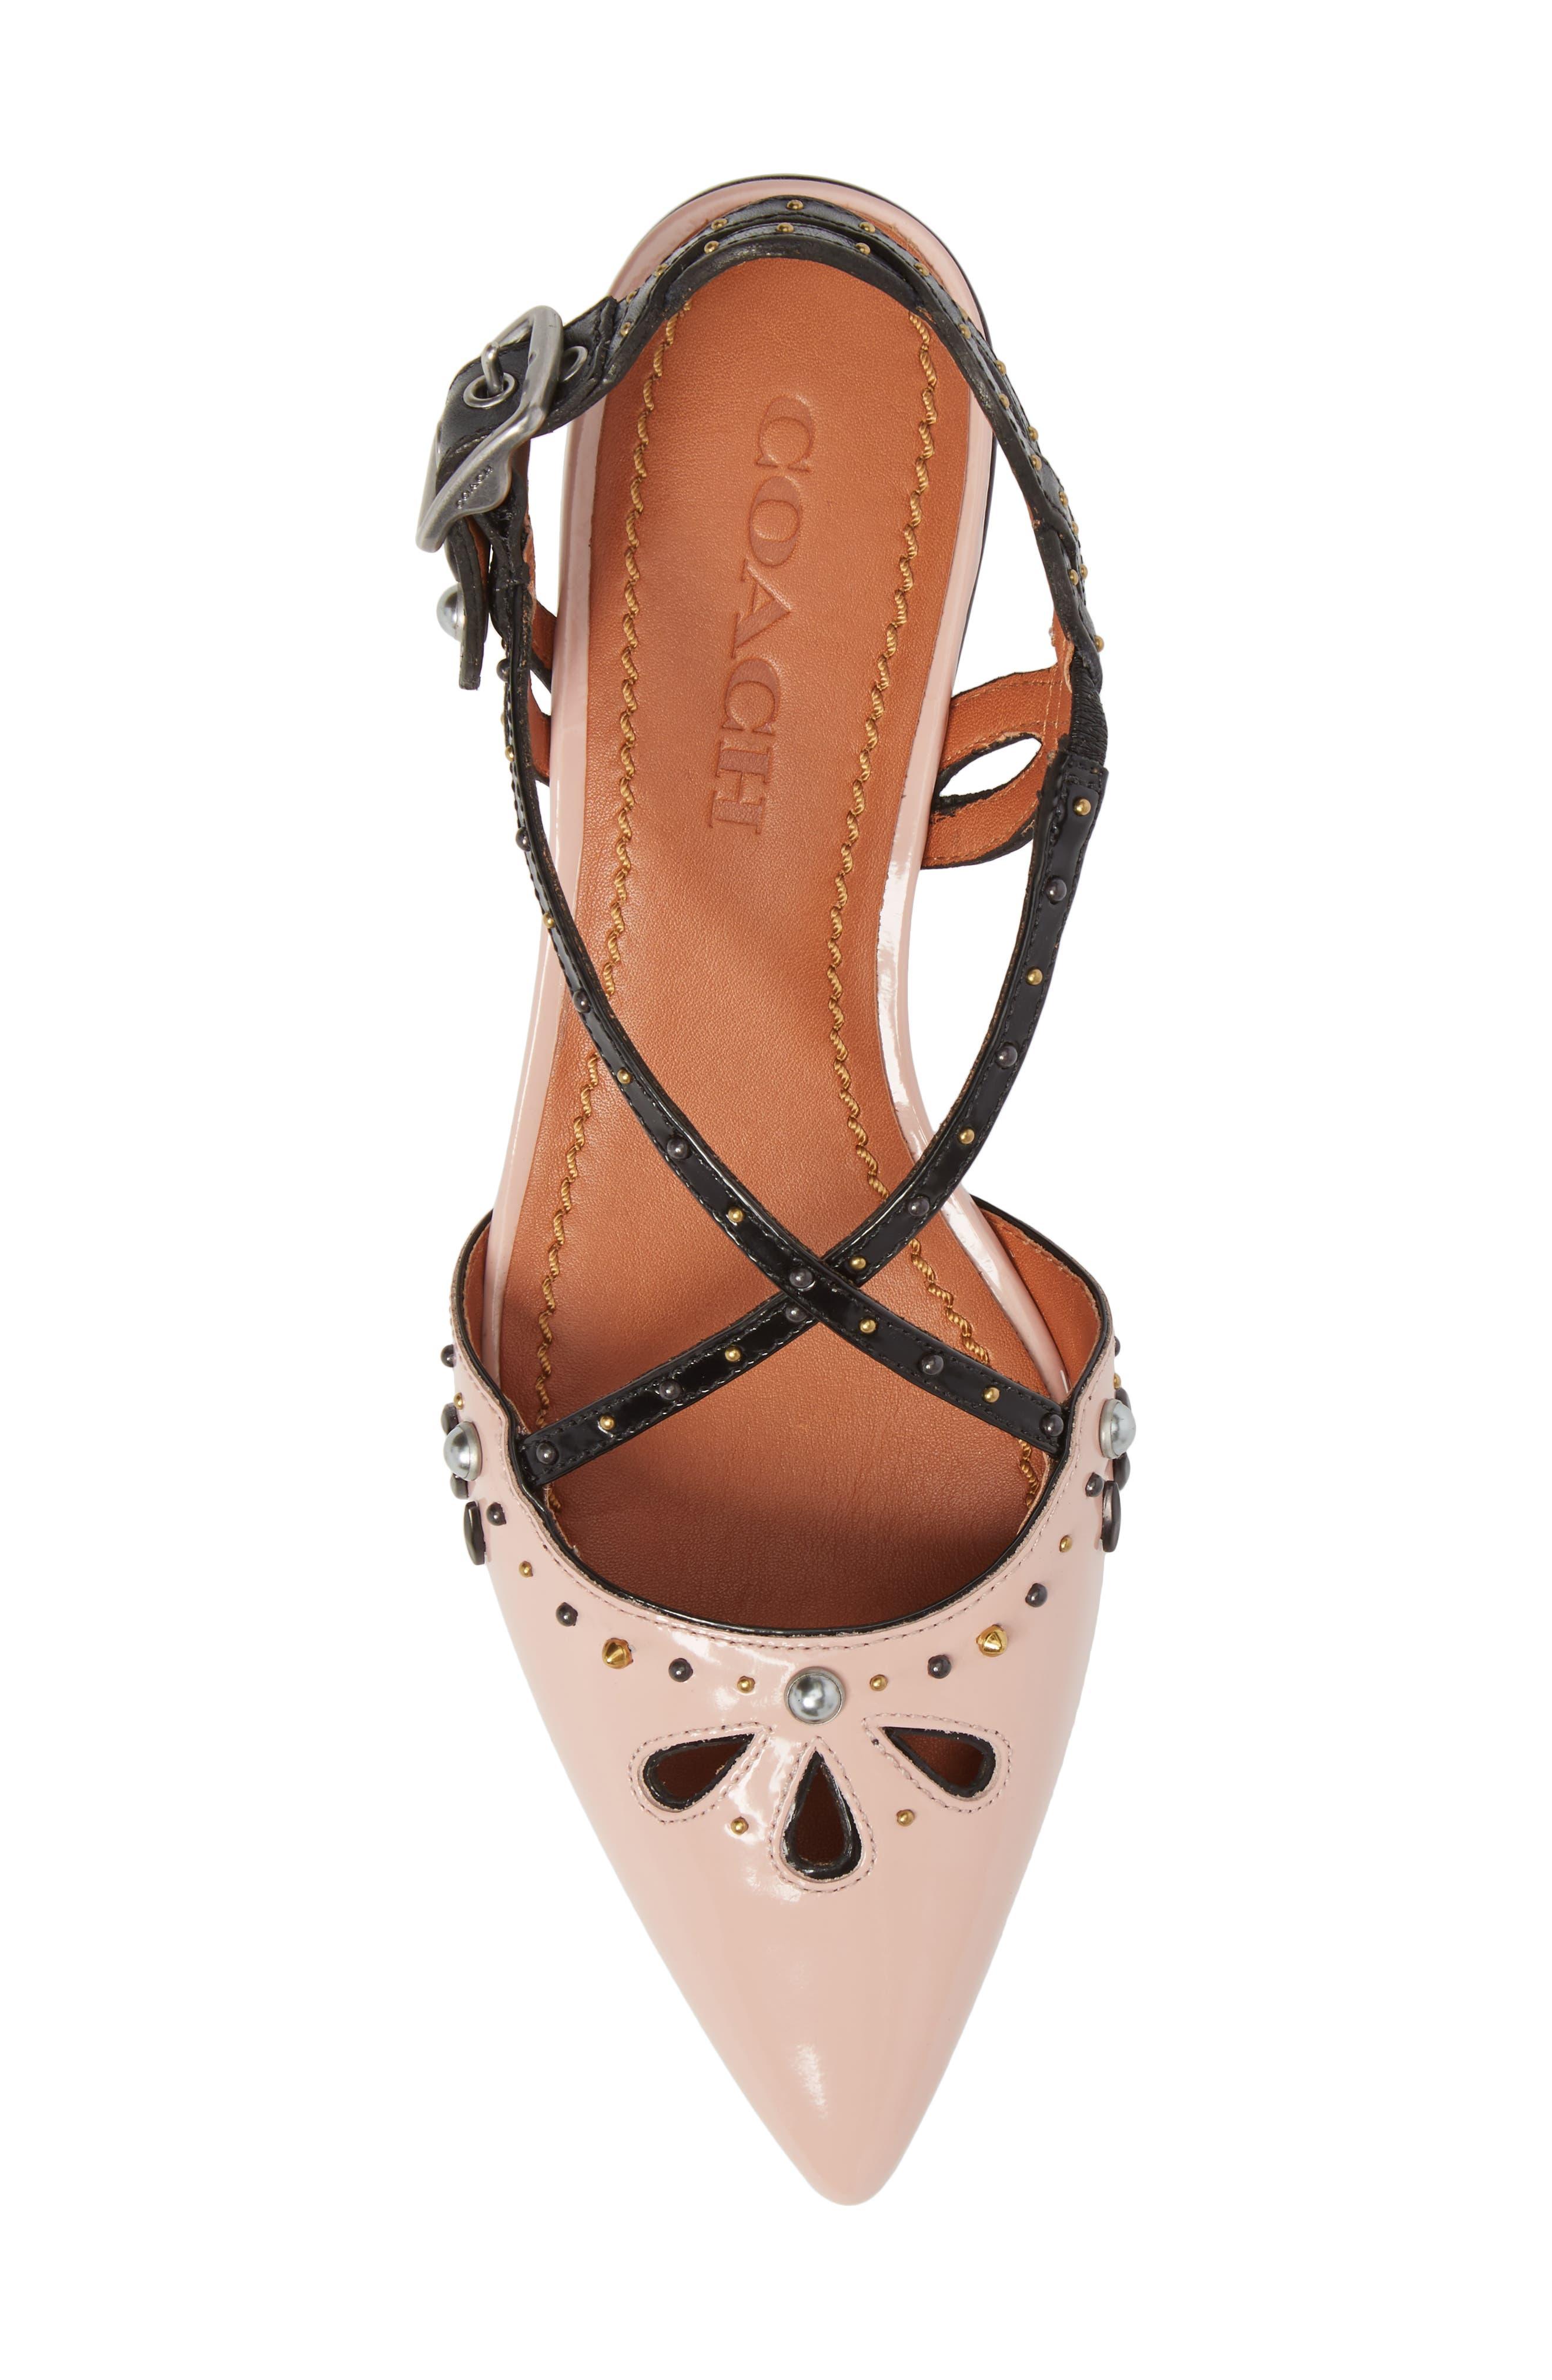 Prairie Rivet Sandal,                             Alternate thumbnail 5, color,                             Pink/ Black Leather